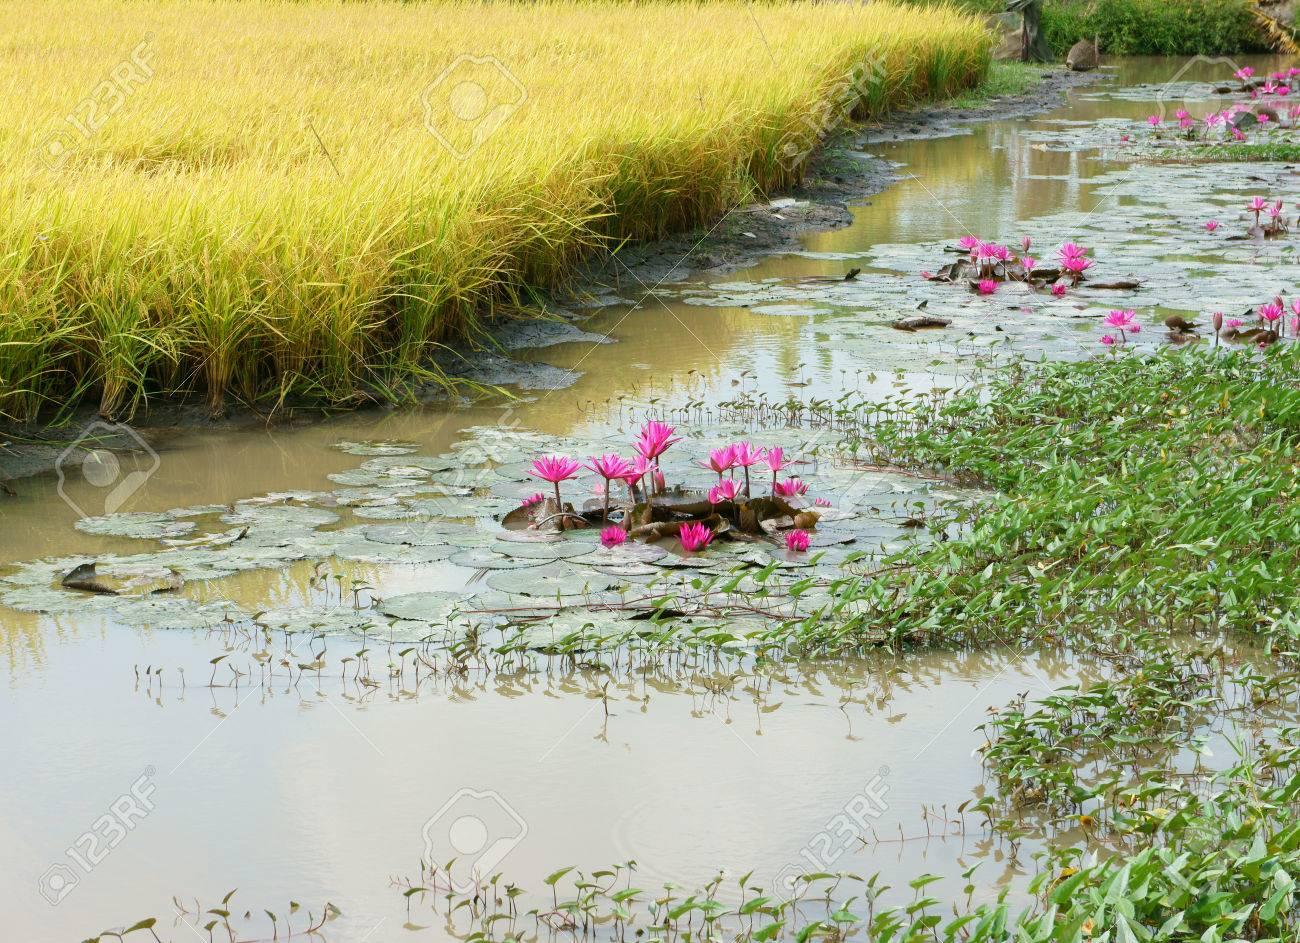 Mekong Delta Vietnam Rural Landscape With Yellow Rice Field